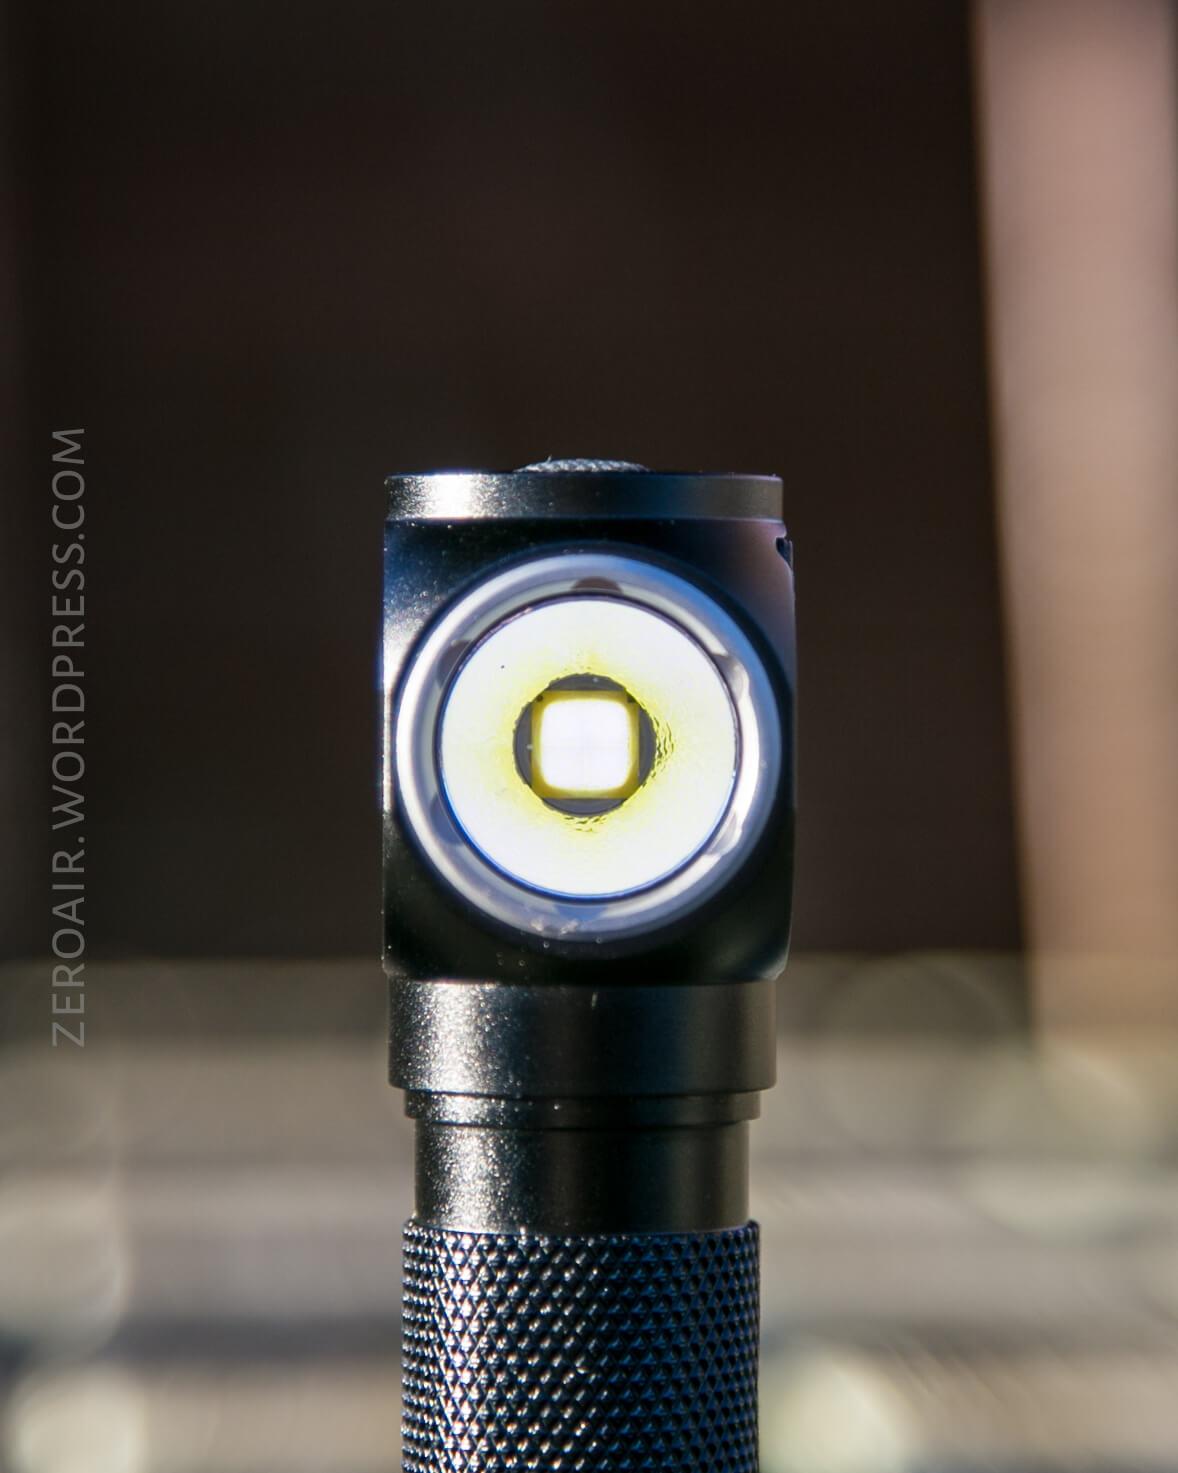 37_zeroair_reviews_thrunite_th30_headlamp.jpg